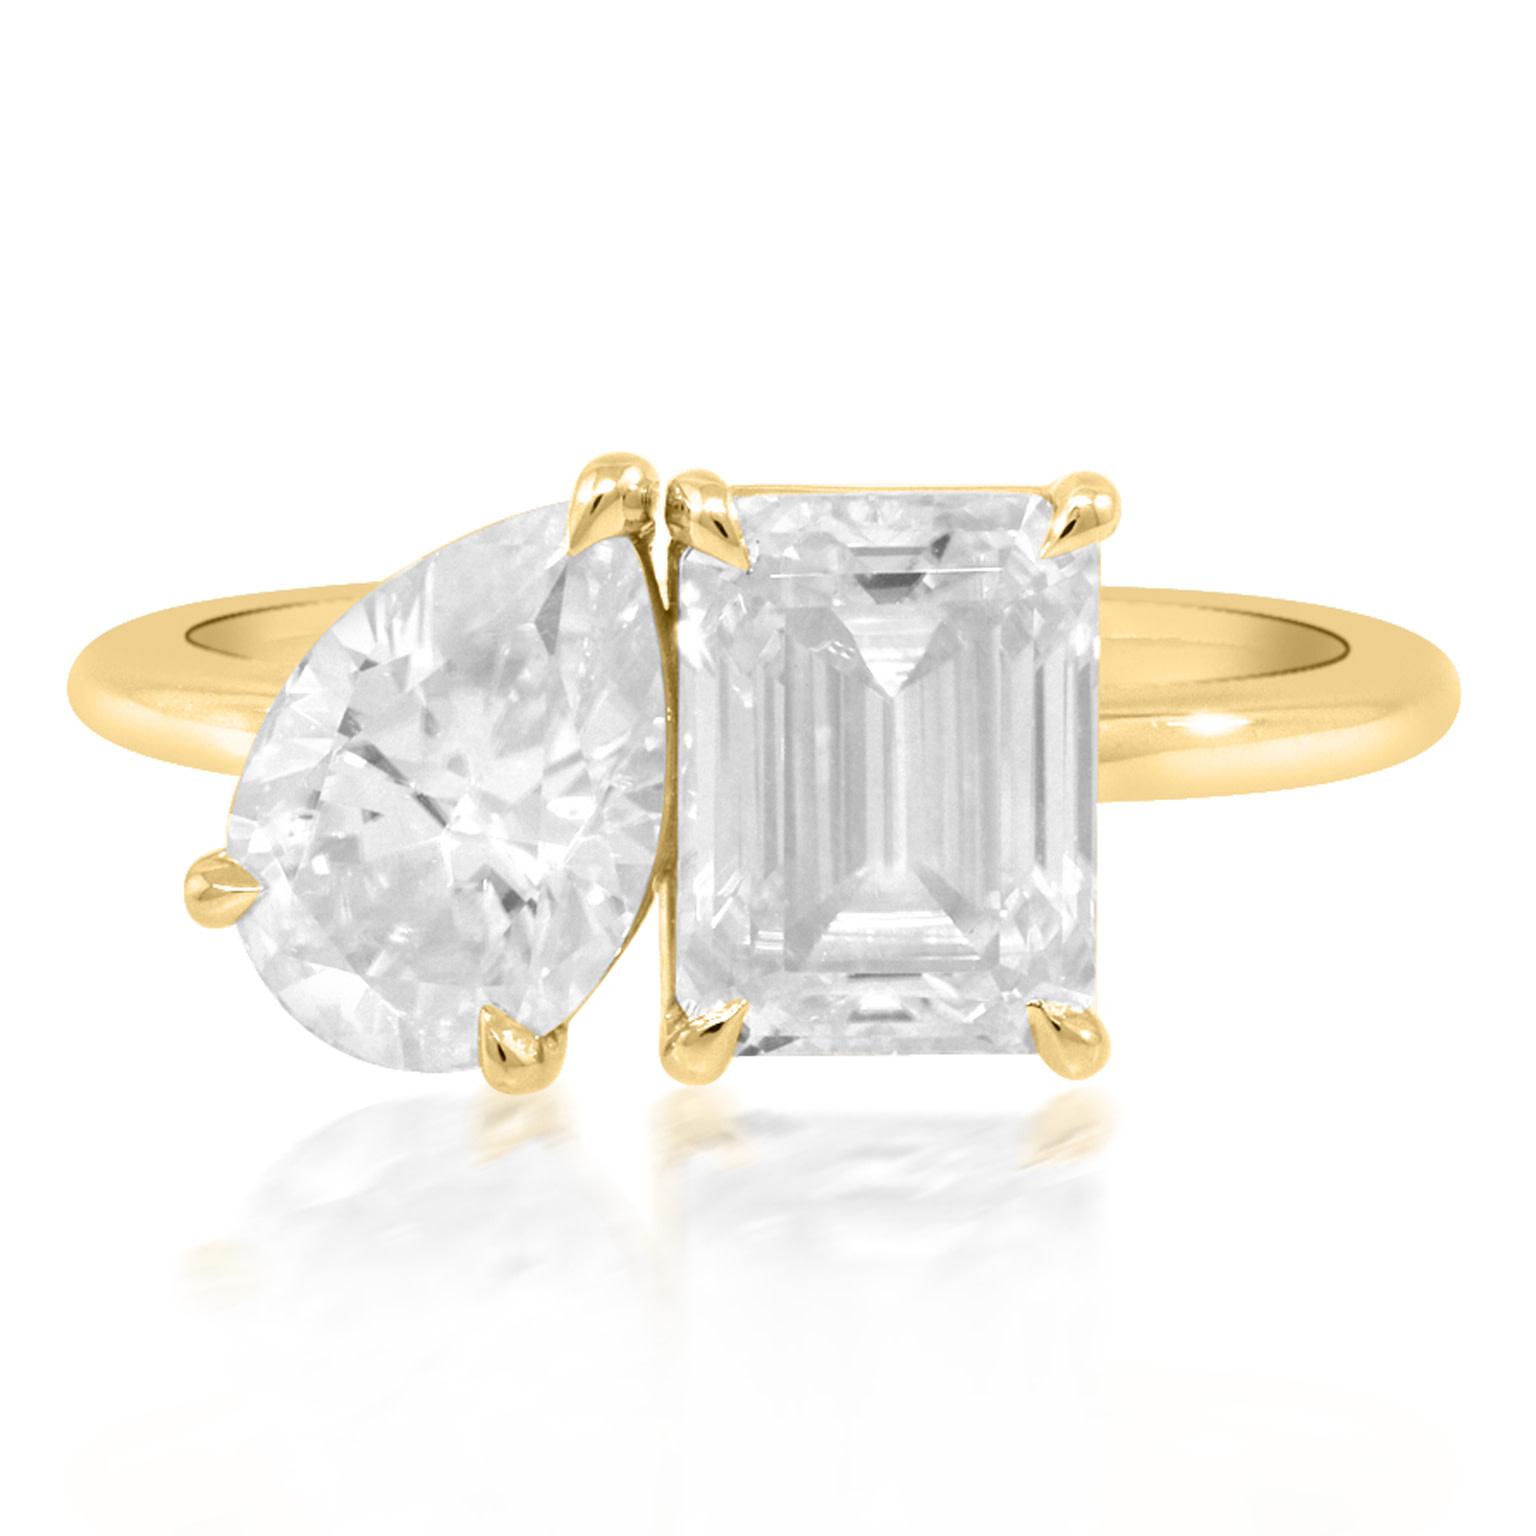 Trabert Goldsmiths Emerald and Pear Cut Moissanite Toi et Moi Ring